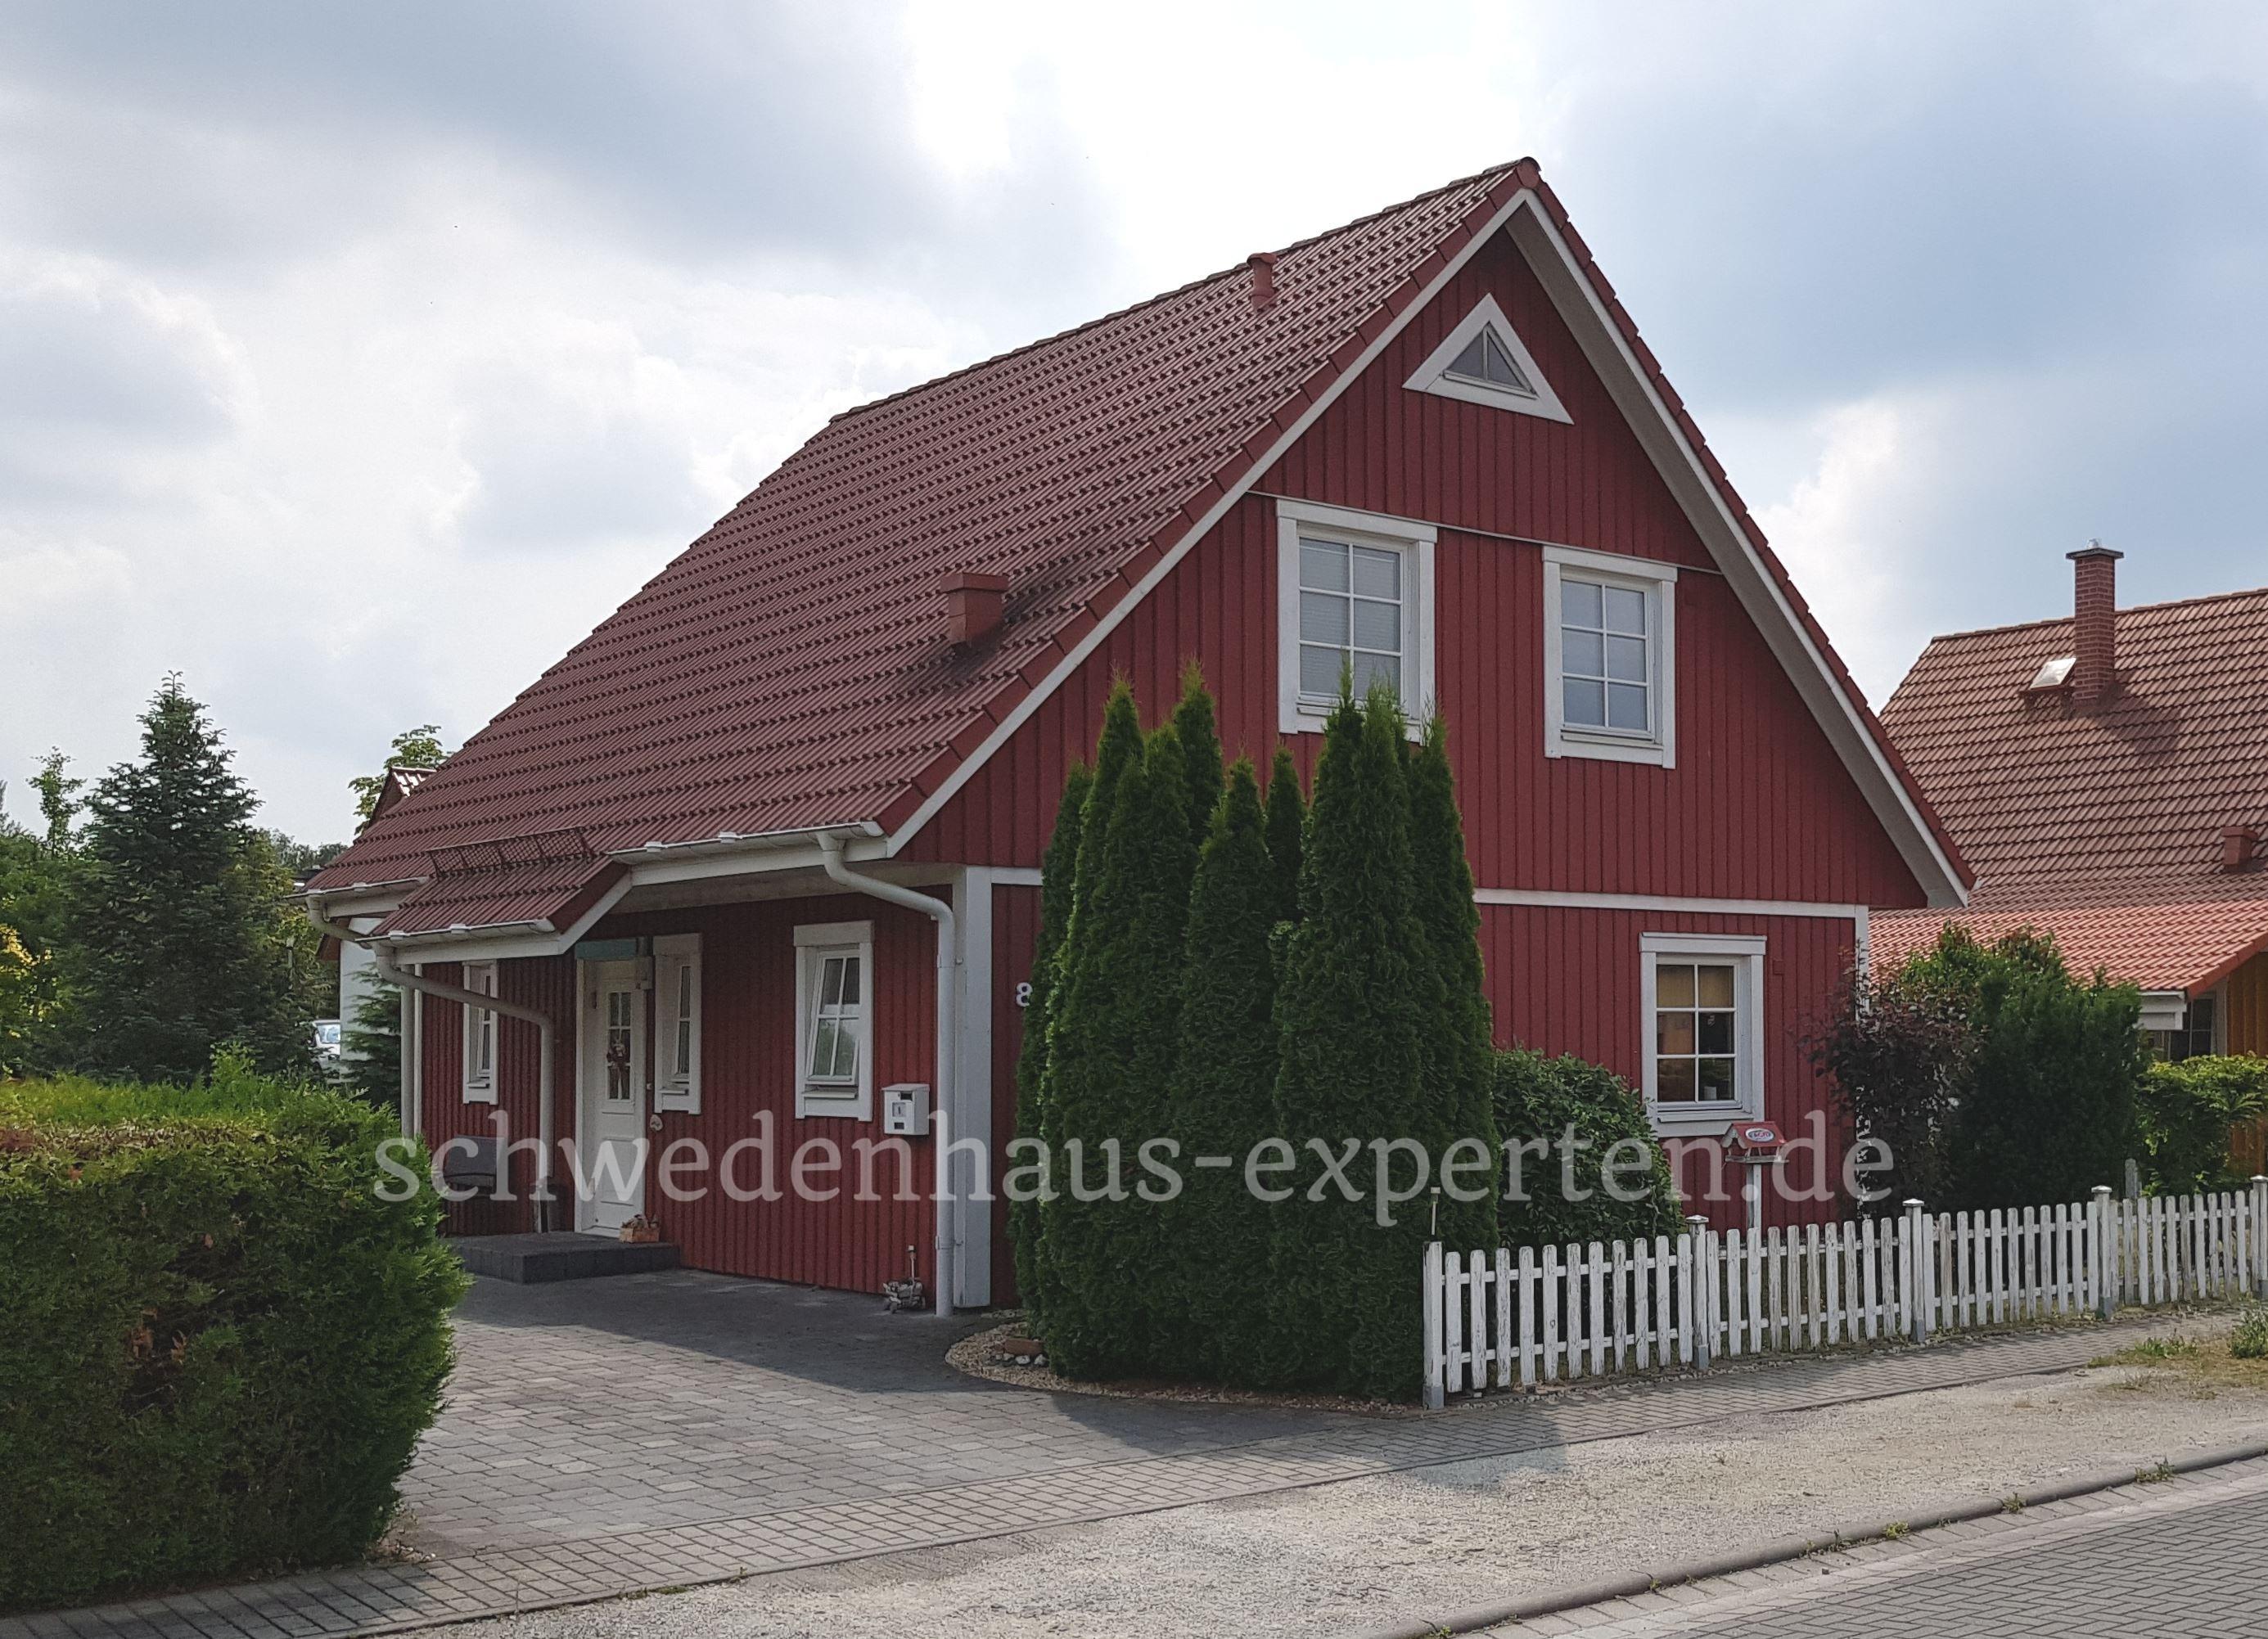 kronan schwedenhaus. Black Bedroom Furniture Sets. Home Design Ideas